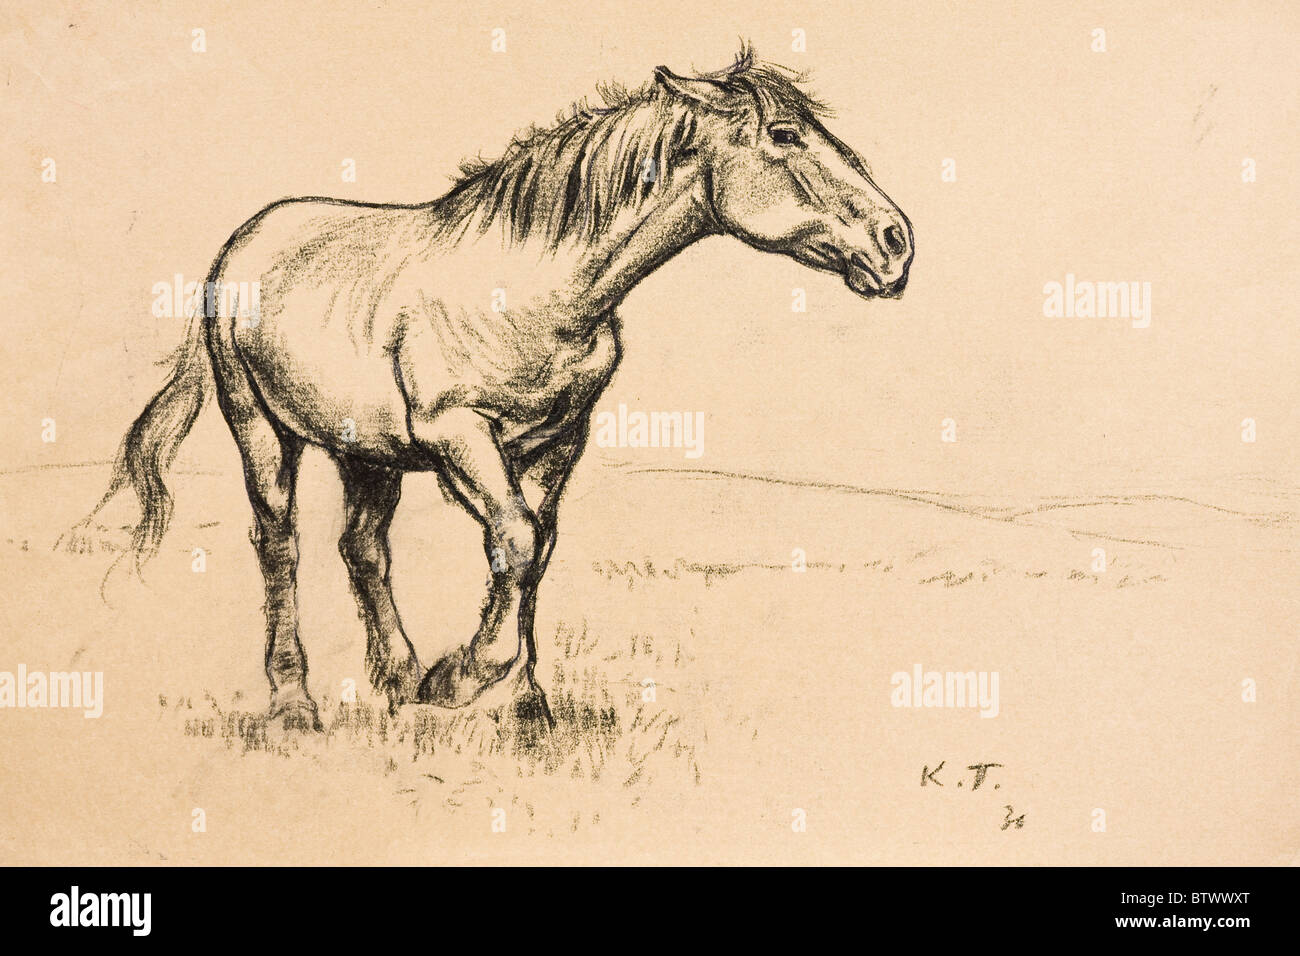 Horse portrait, charcoal on paper by Kurt Tessmann, 1936 - Stock Image